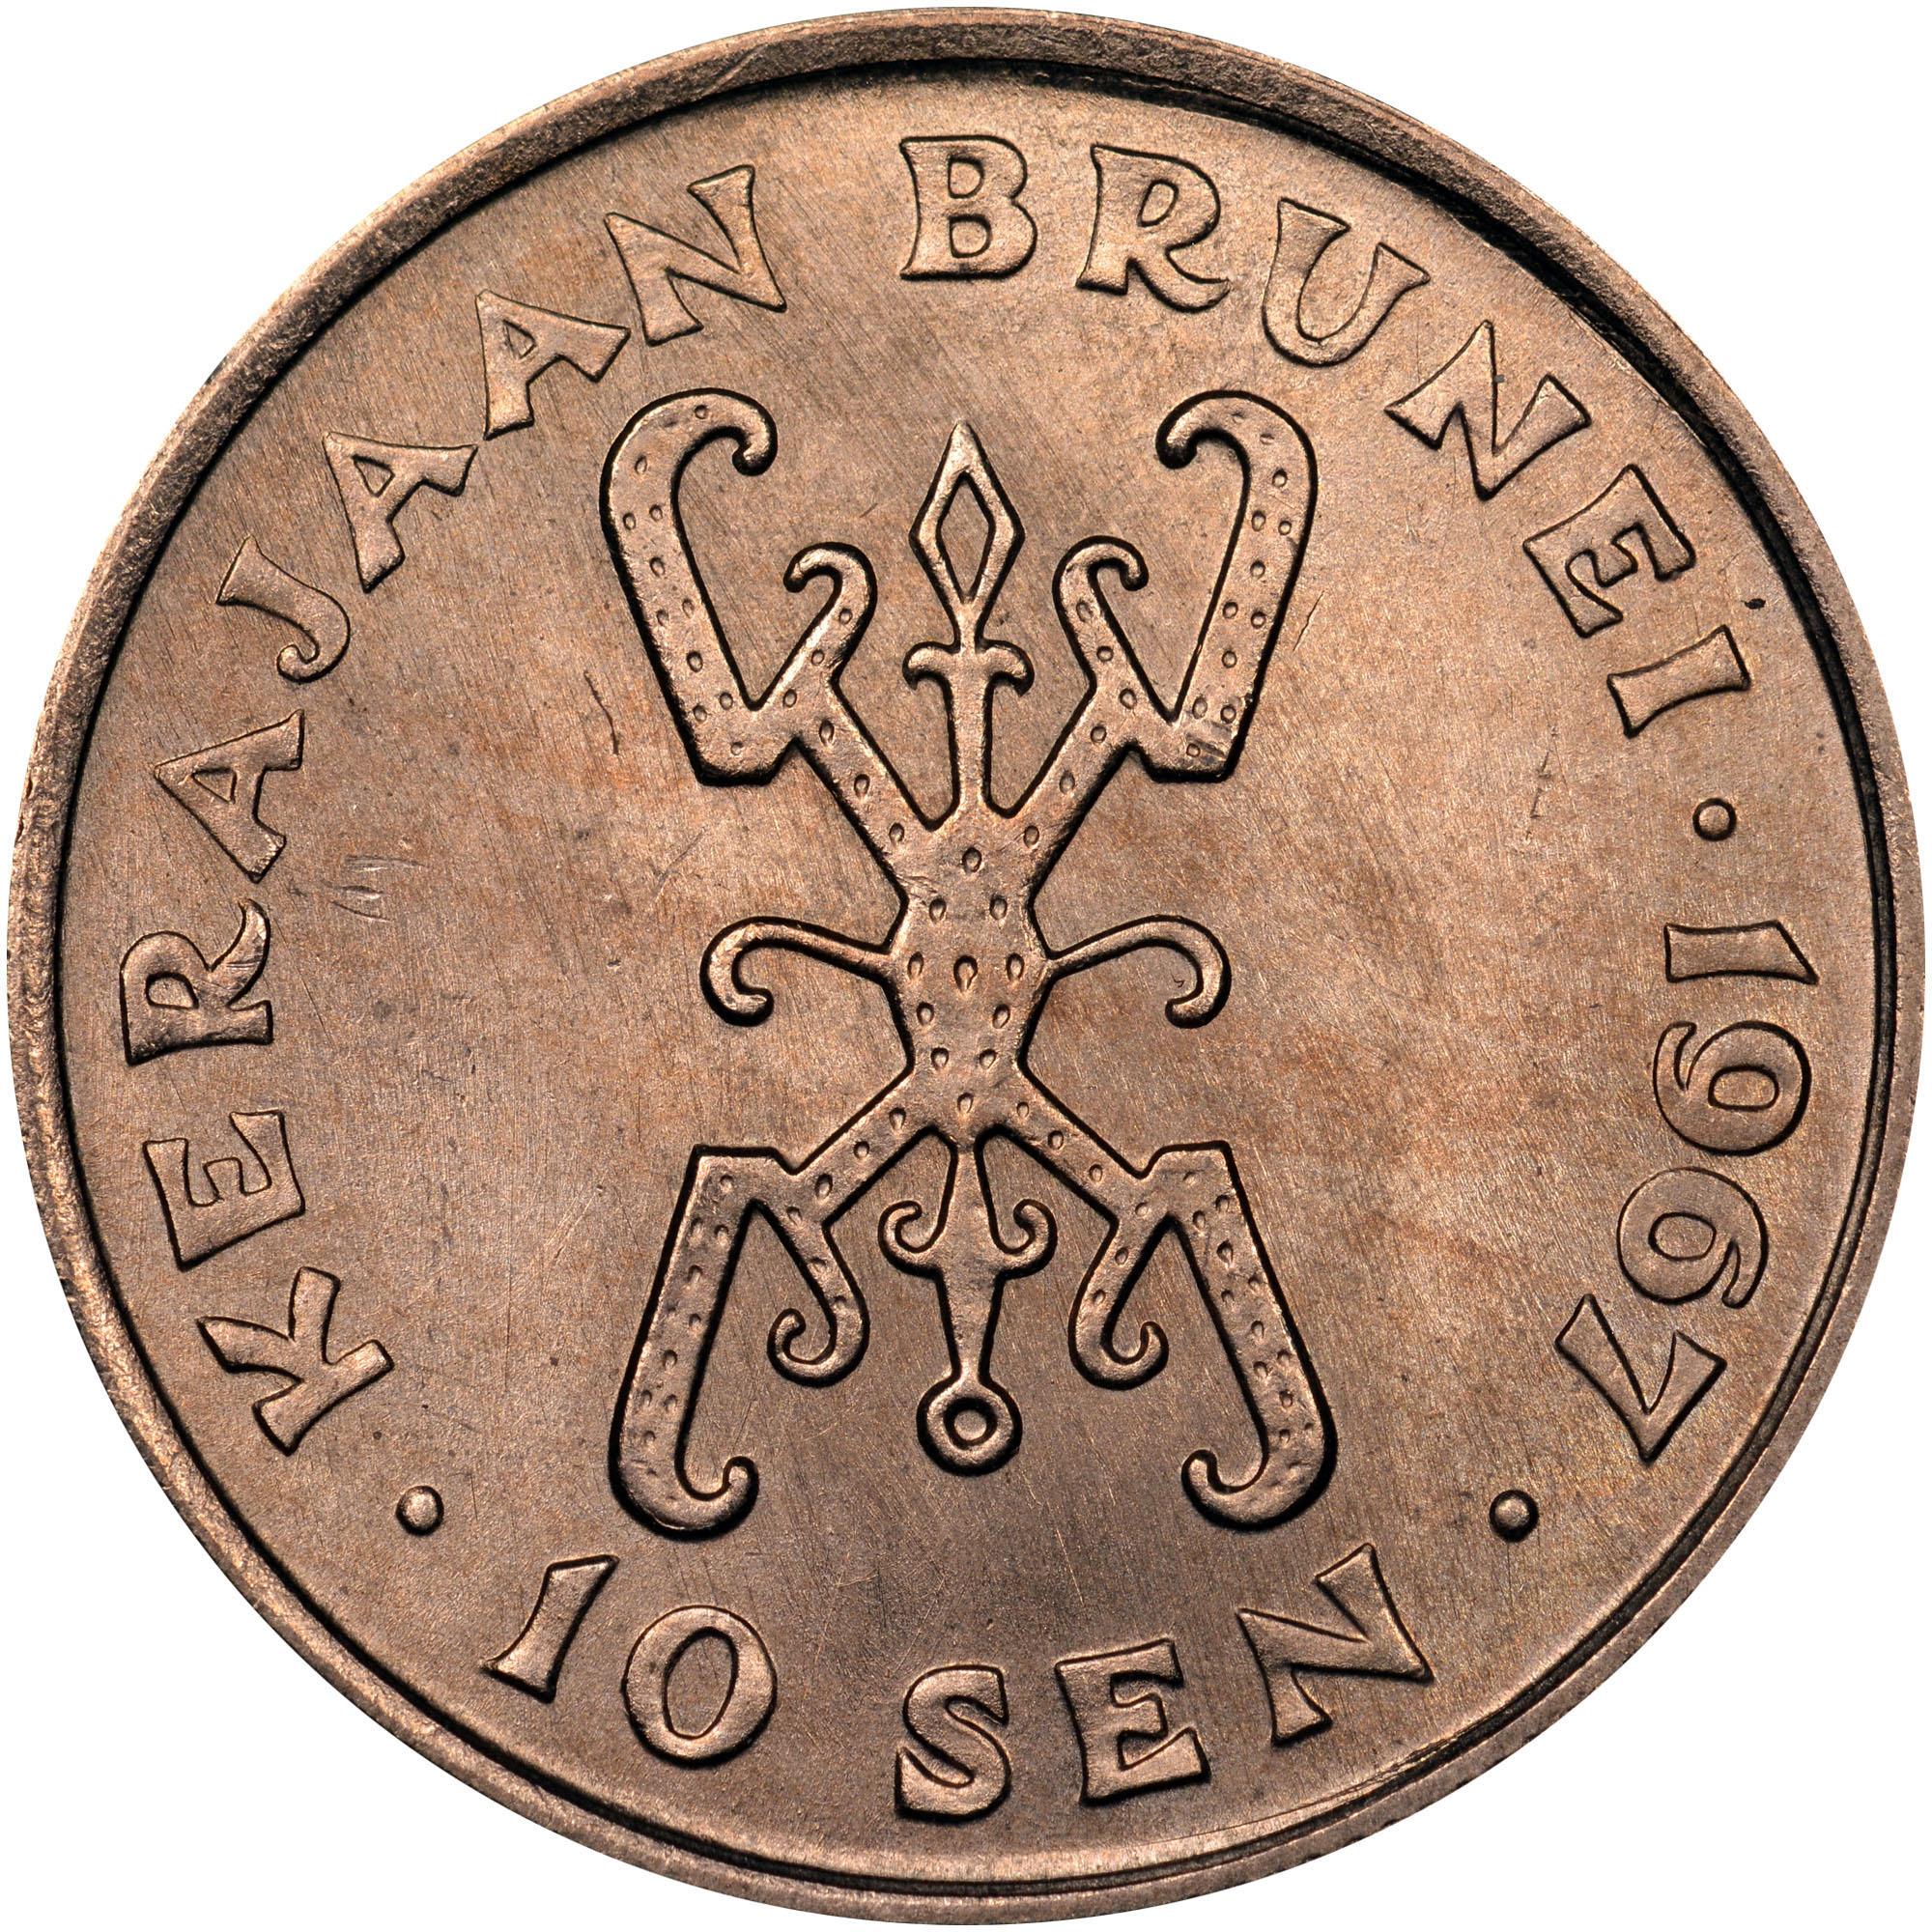 Brunei 10 Sen reverse